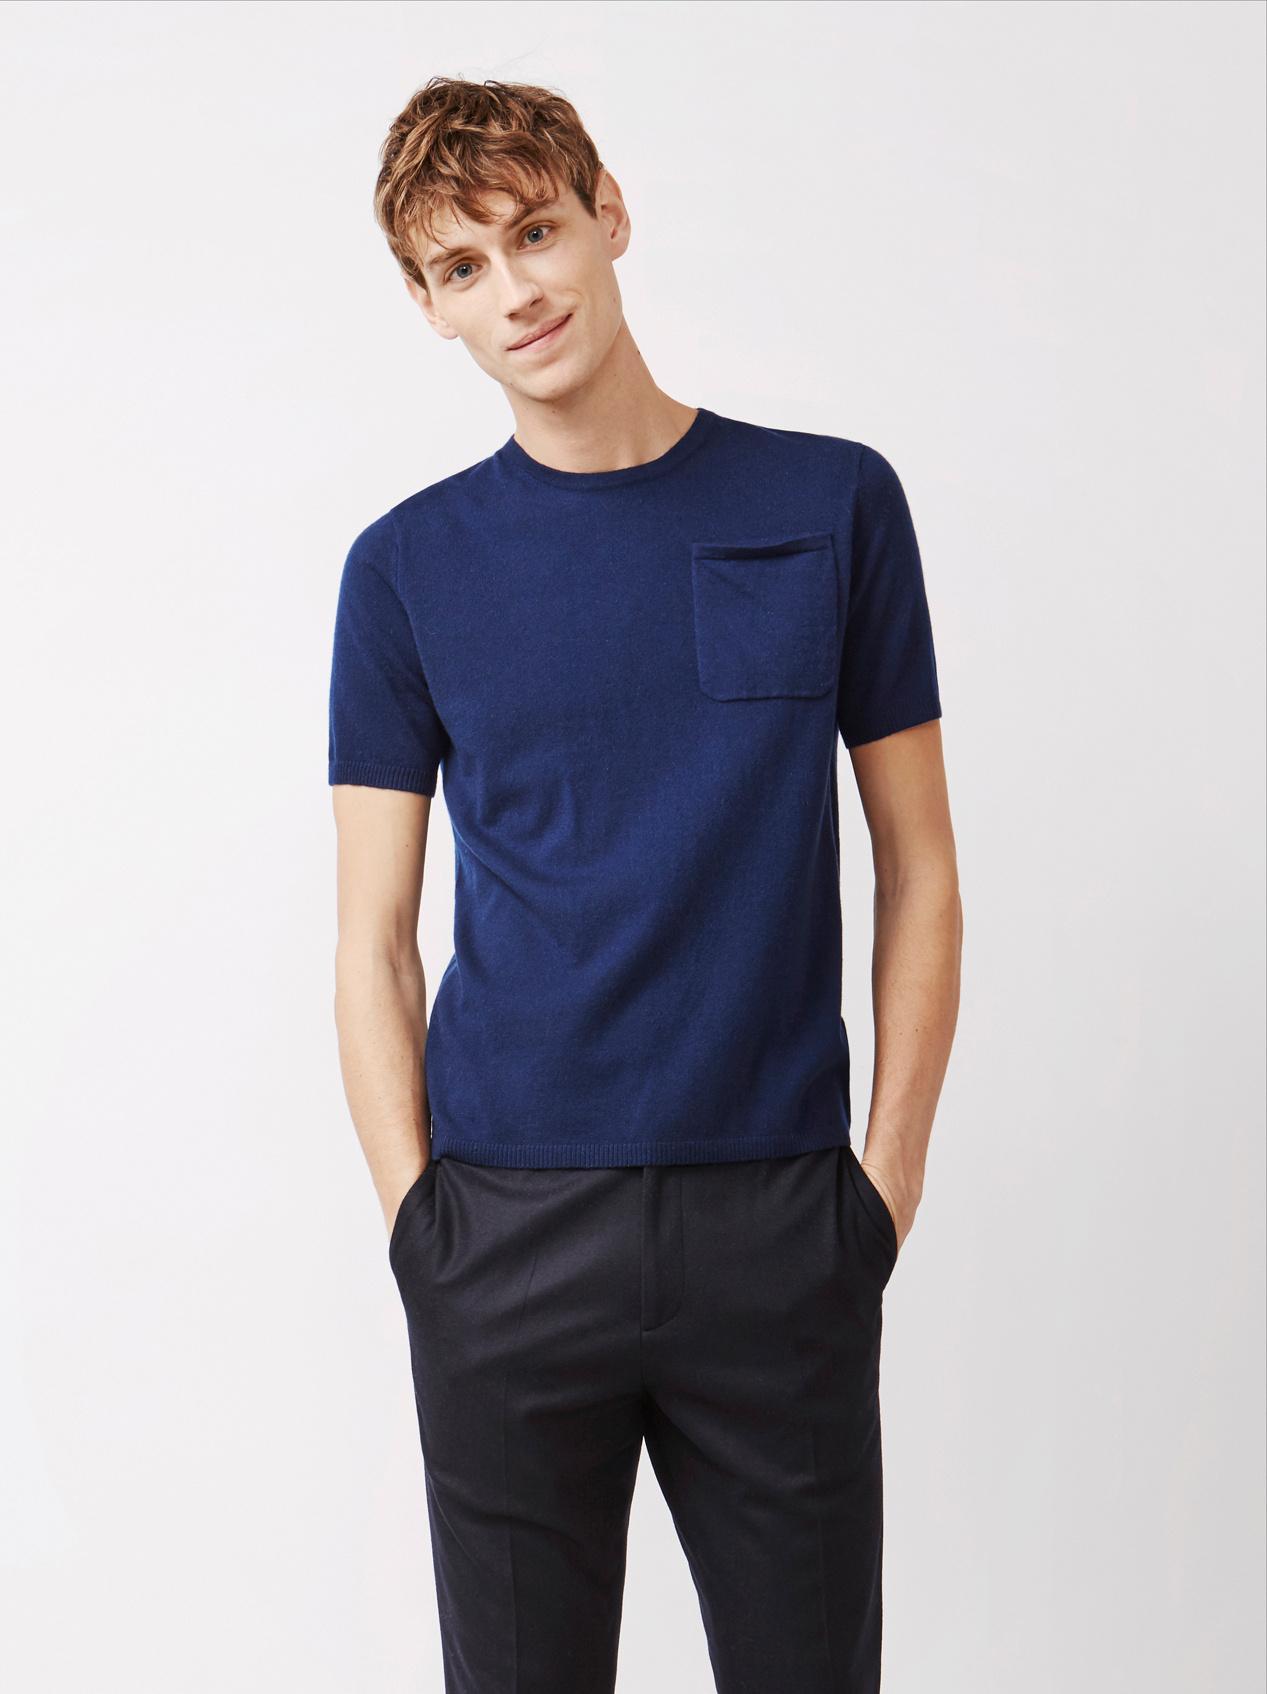 Soft Goat Men's T-Shirt With Pocket Navy